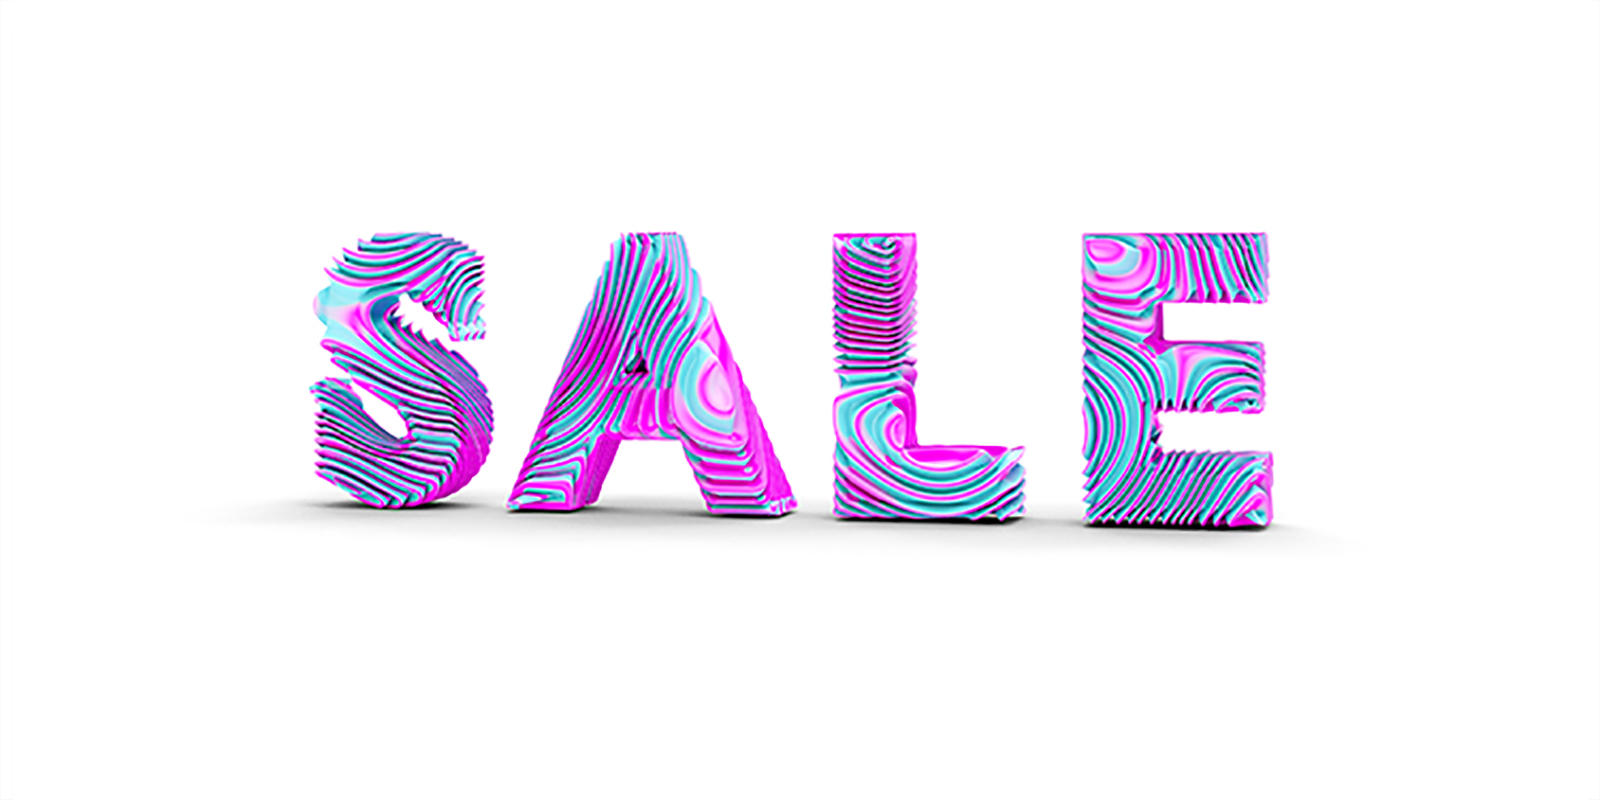 Shop Nordstrom's Winter Sale